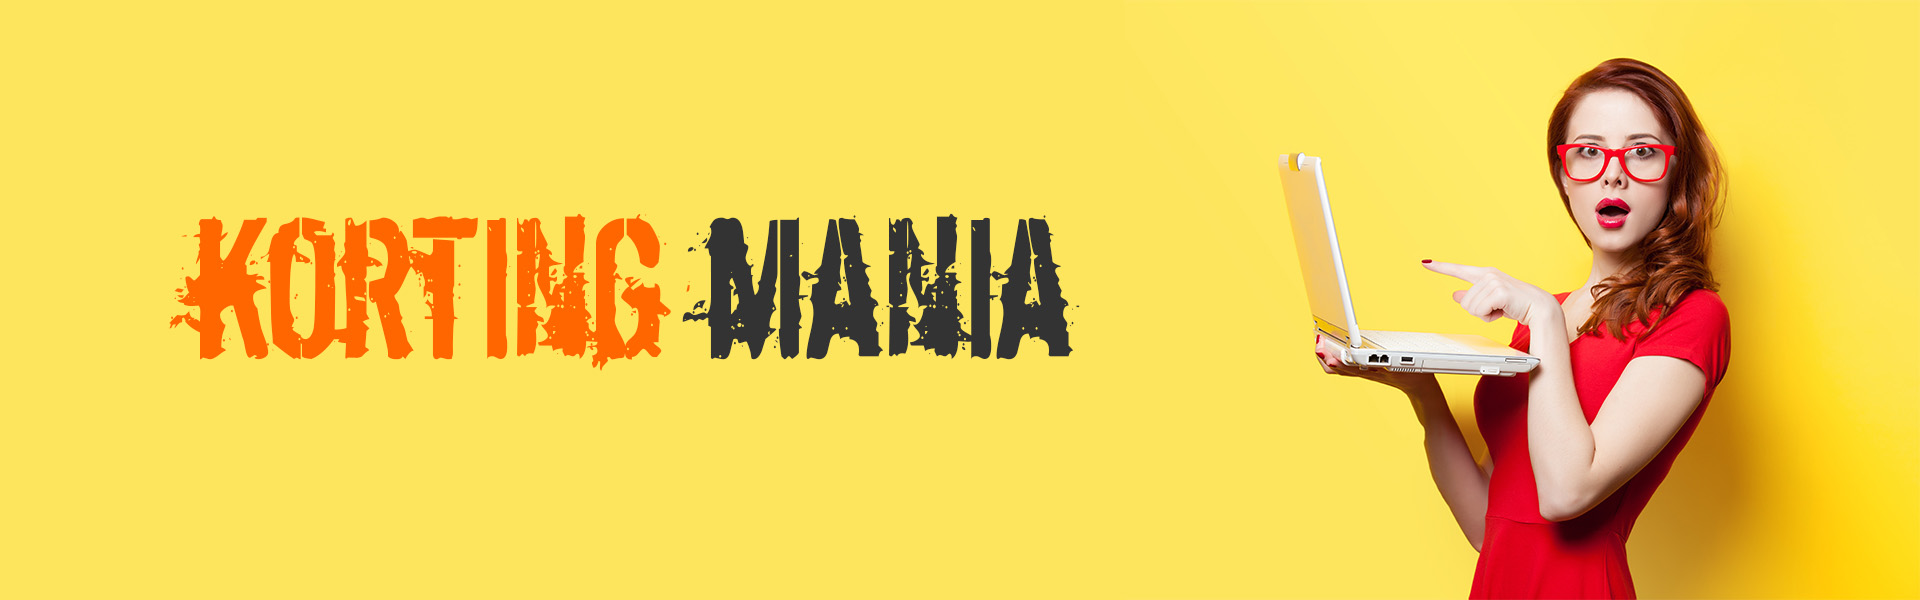 Korting Mania